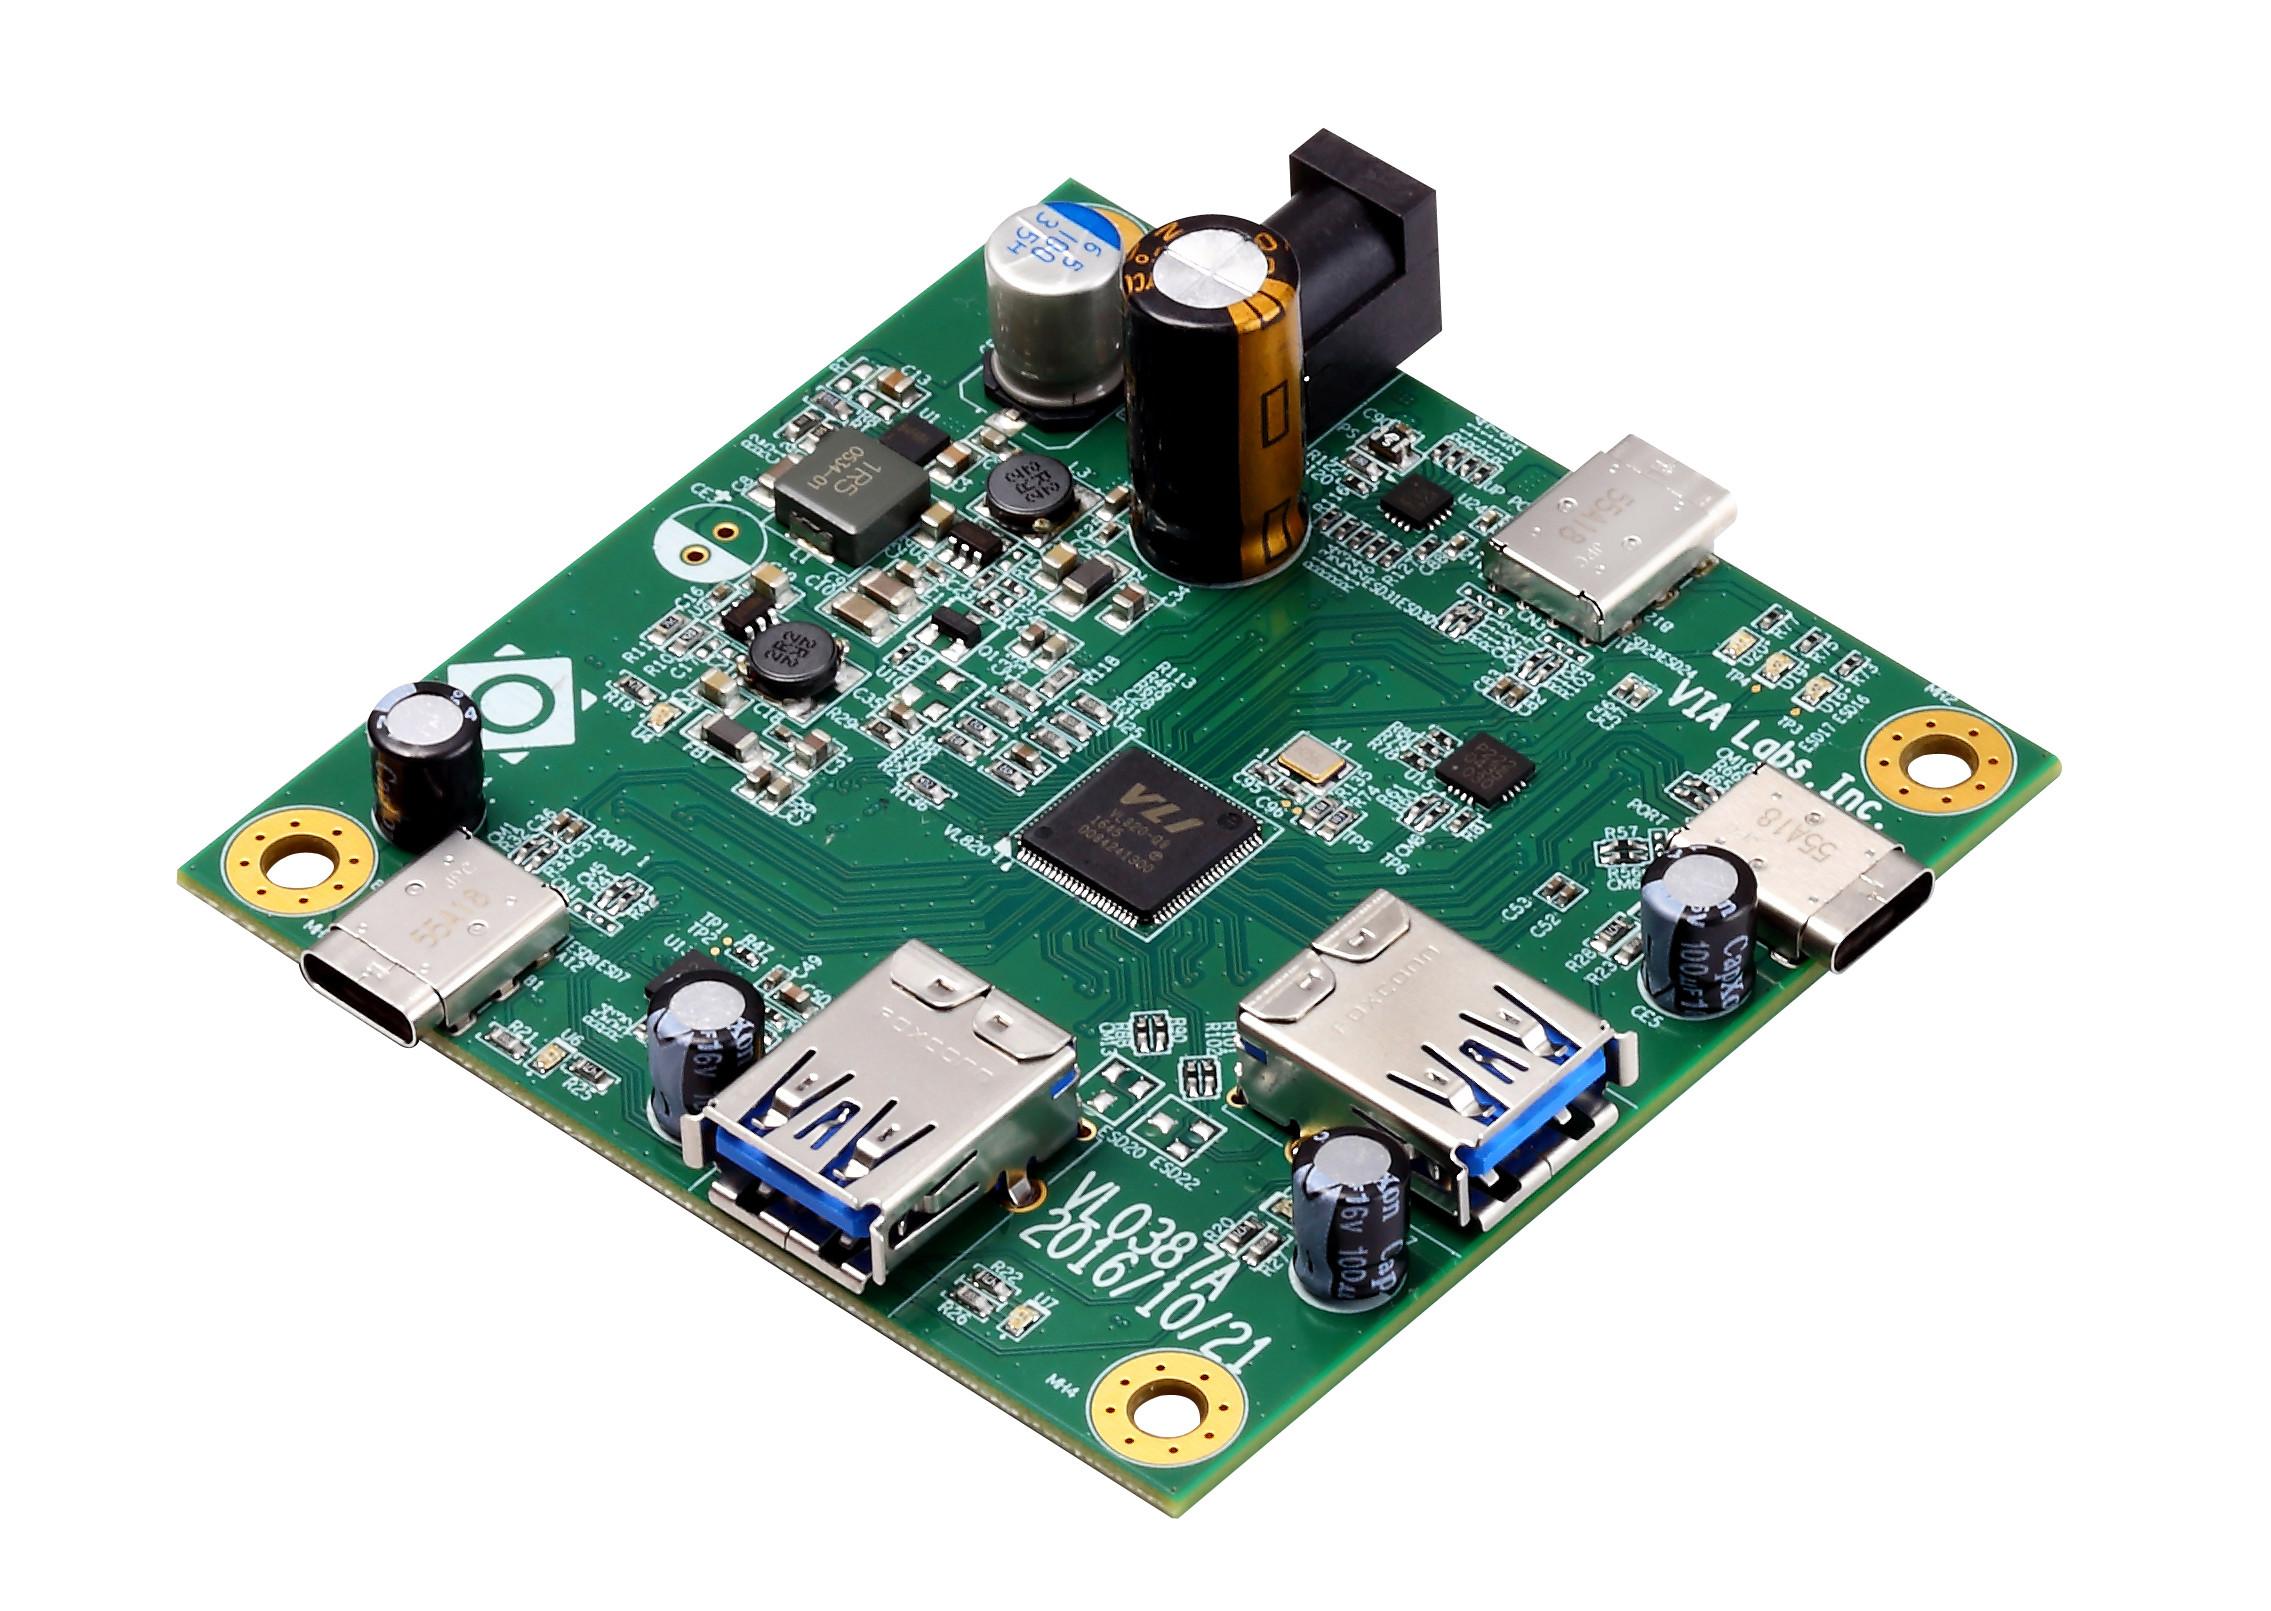 VIA Labs VL805 USB 3.0 Controller Windows 8